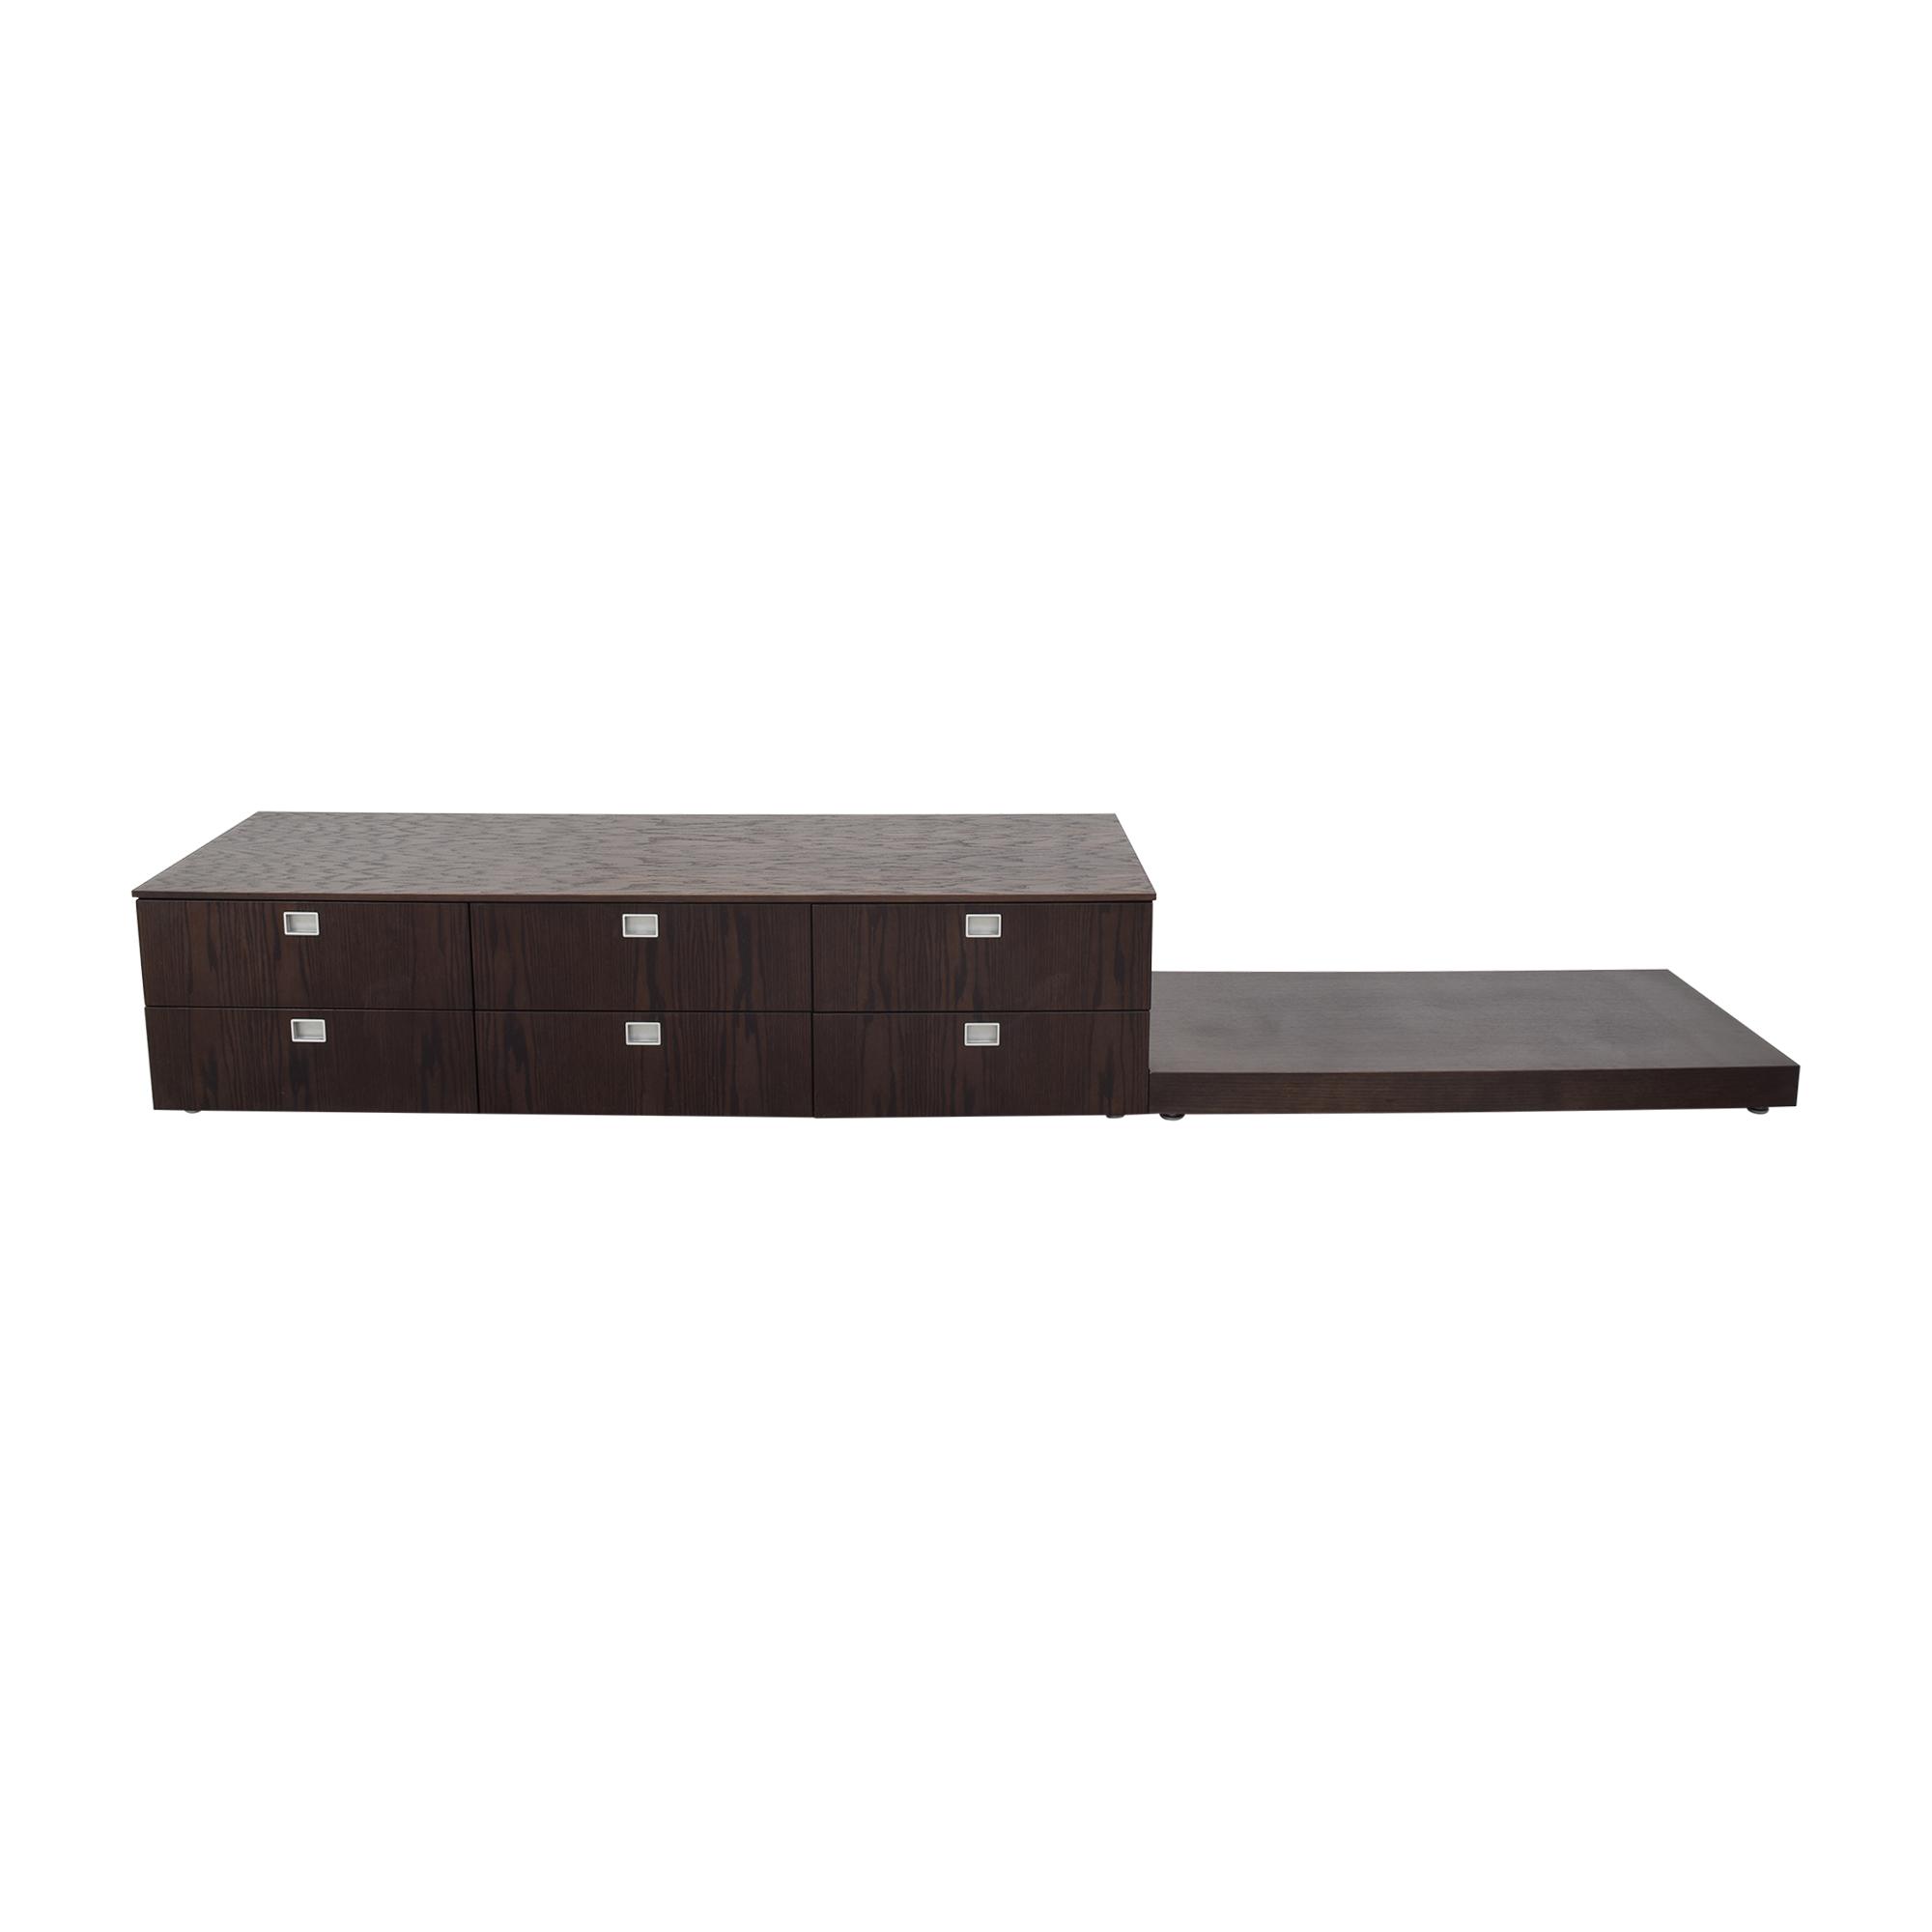 Interni Interni Sideboard with Platform for sale